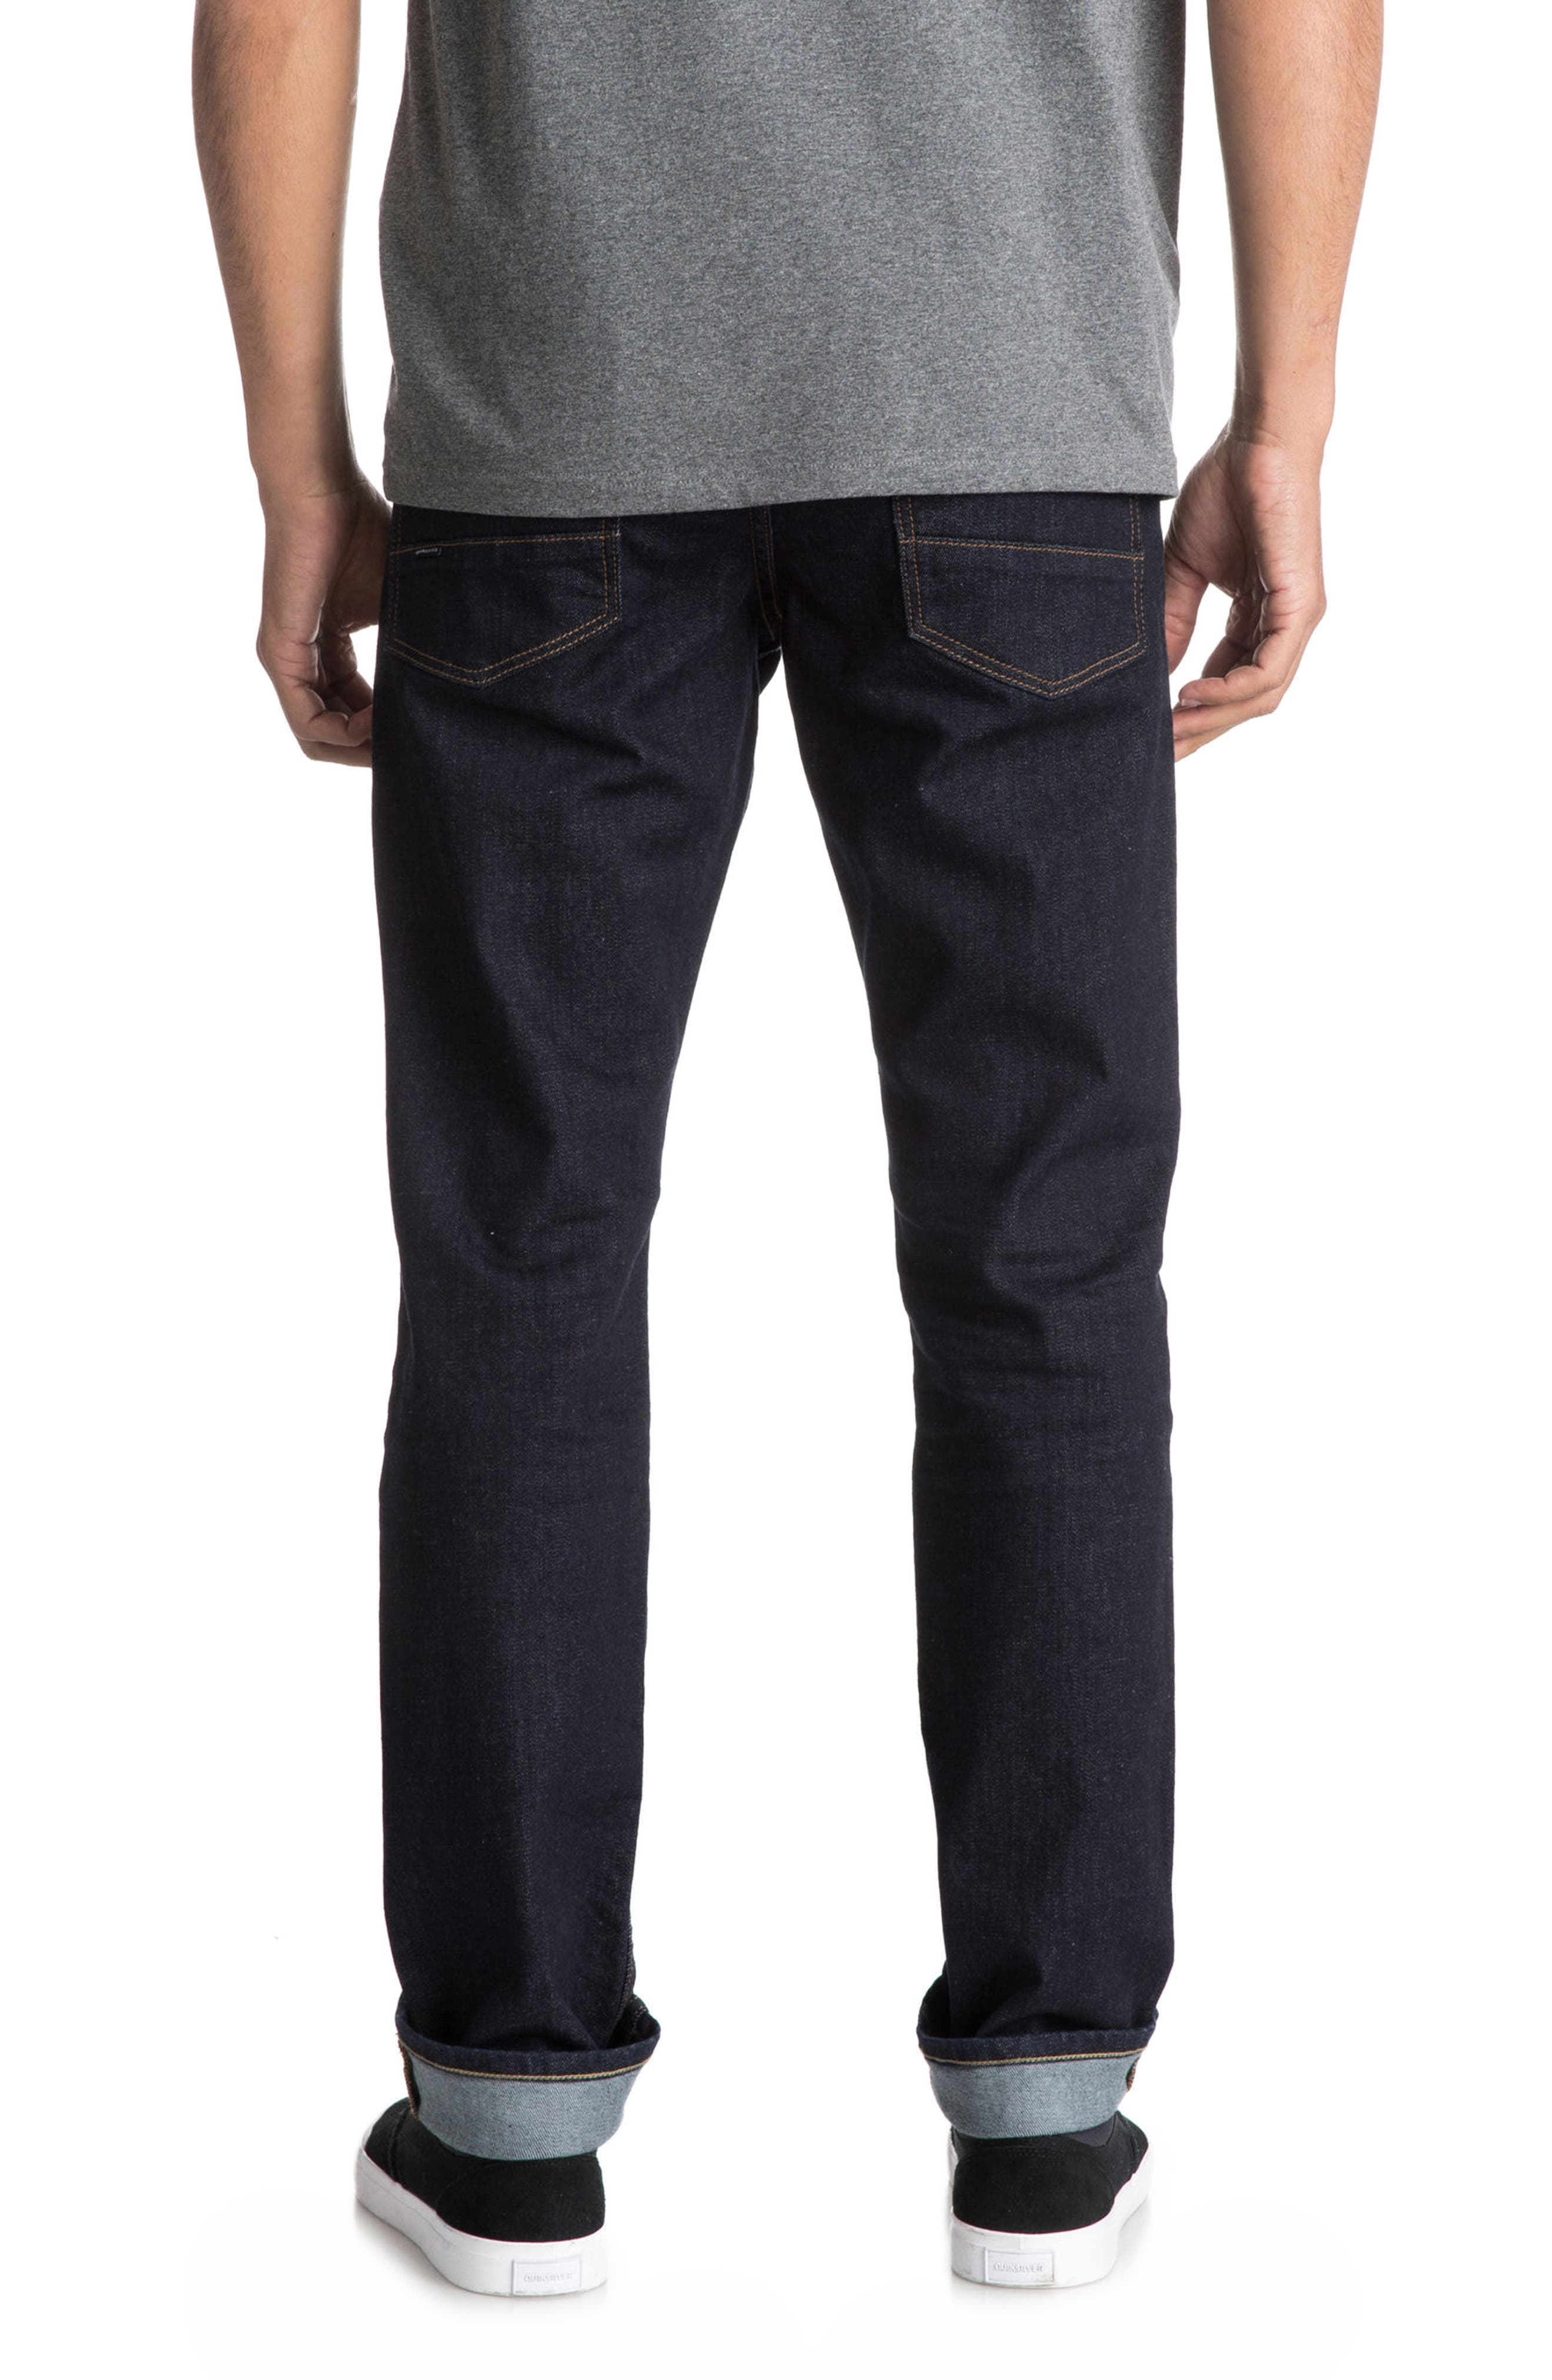 Revolver Slim Fit Jeans,                             Alternate thumbnail 2, color,                             401